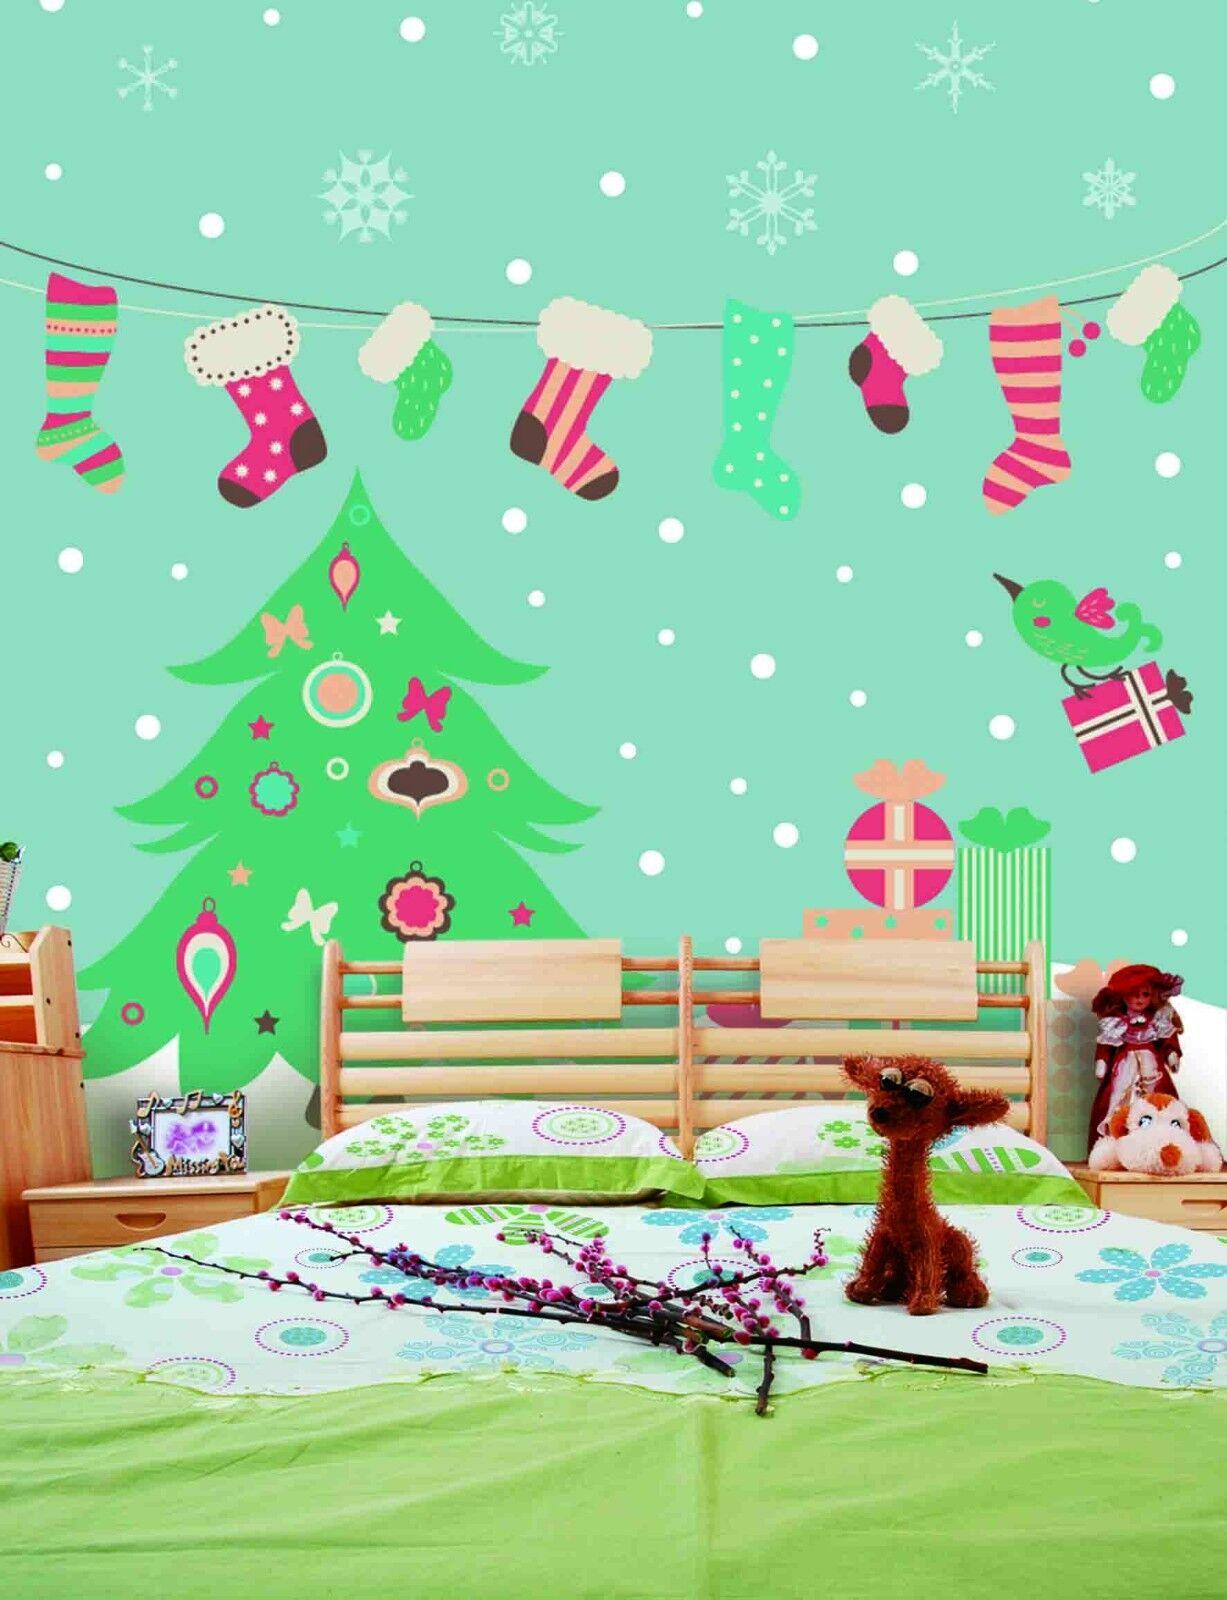 3D Christmas tree cartoon Wall Paper Print Decal Wall Deco Wall Indoor Murals